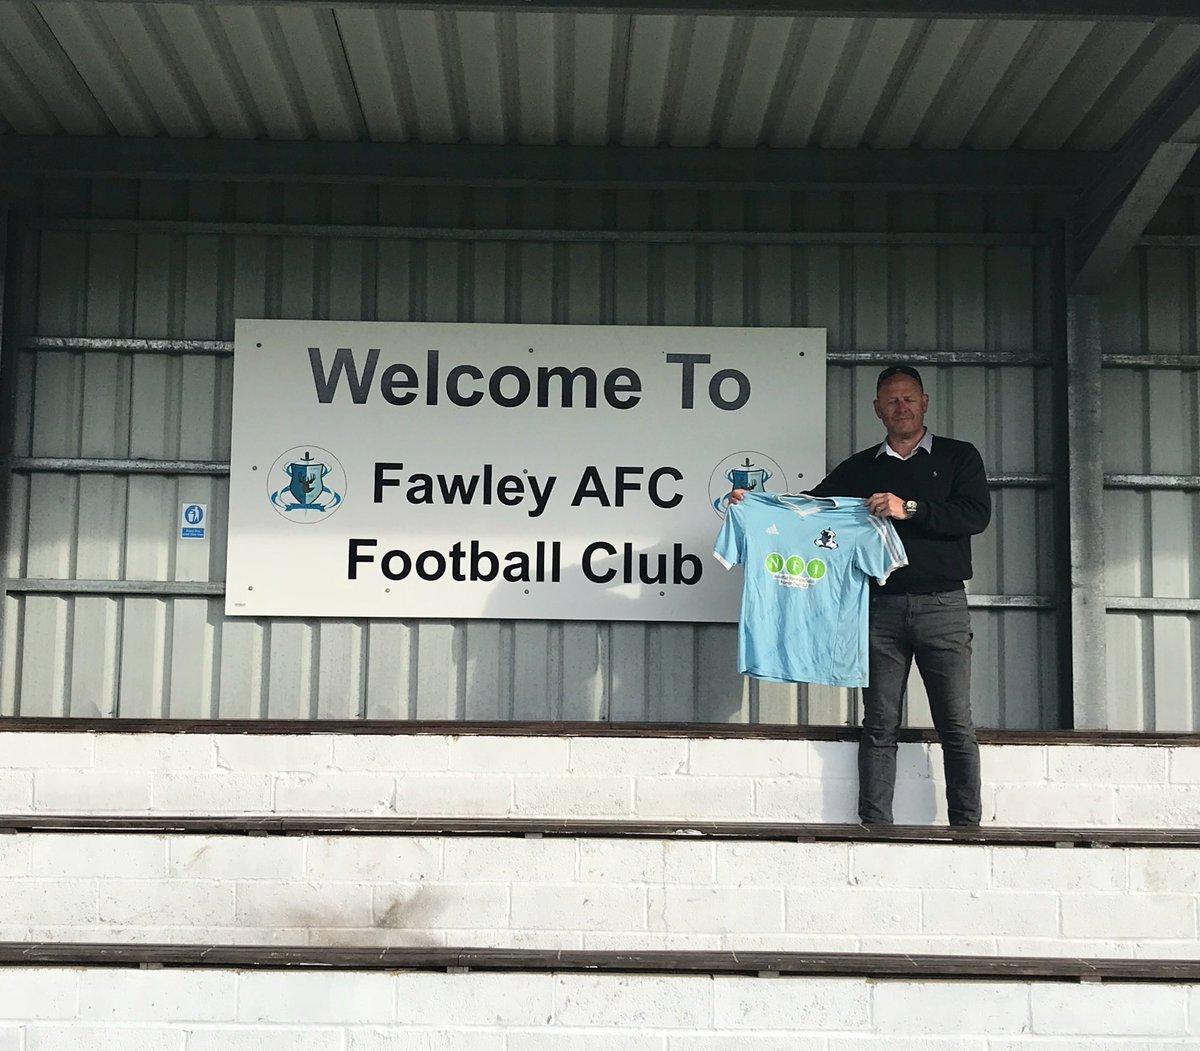 Fawley AFC 🏭 on Twitter: